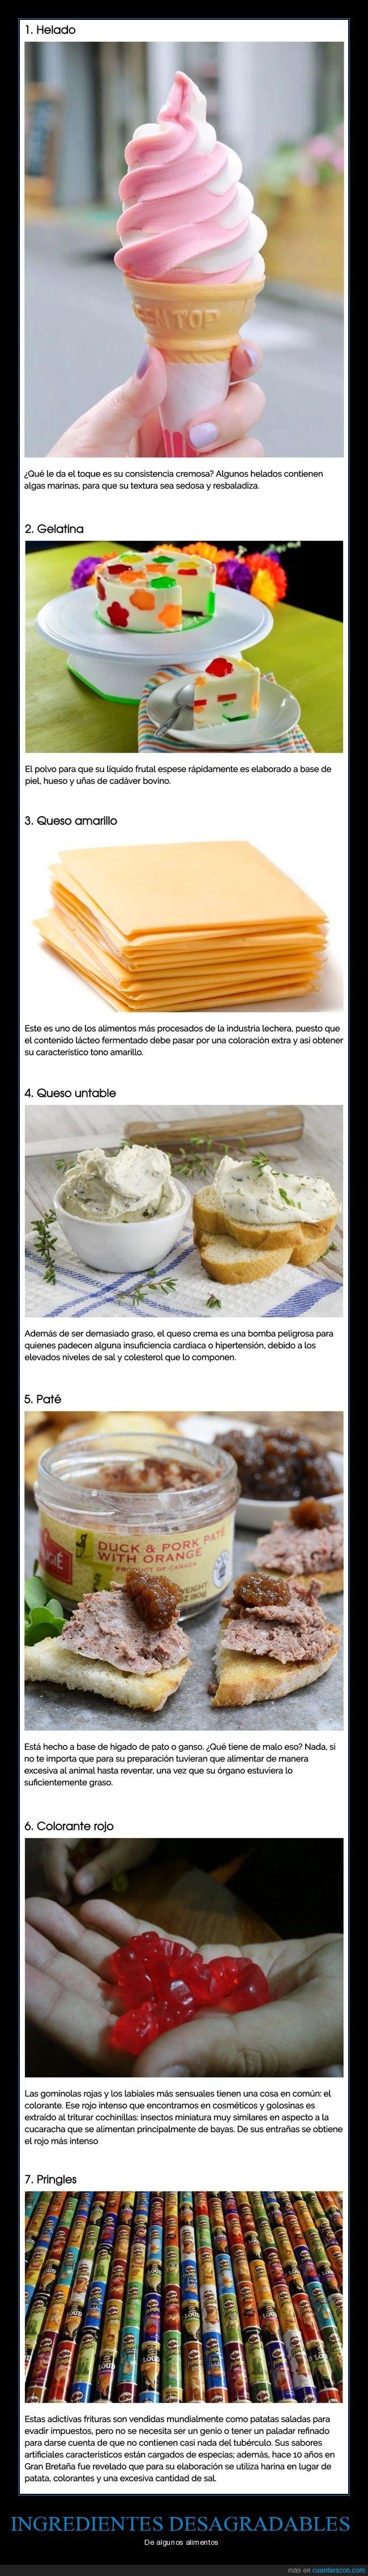 alimentos,curiosidades,ingredientes